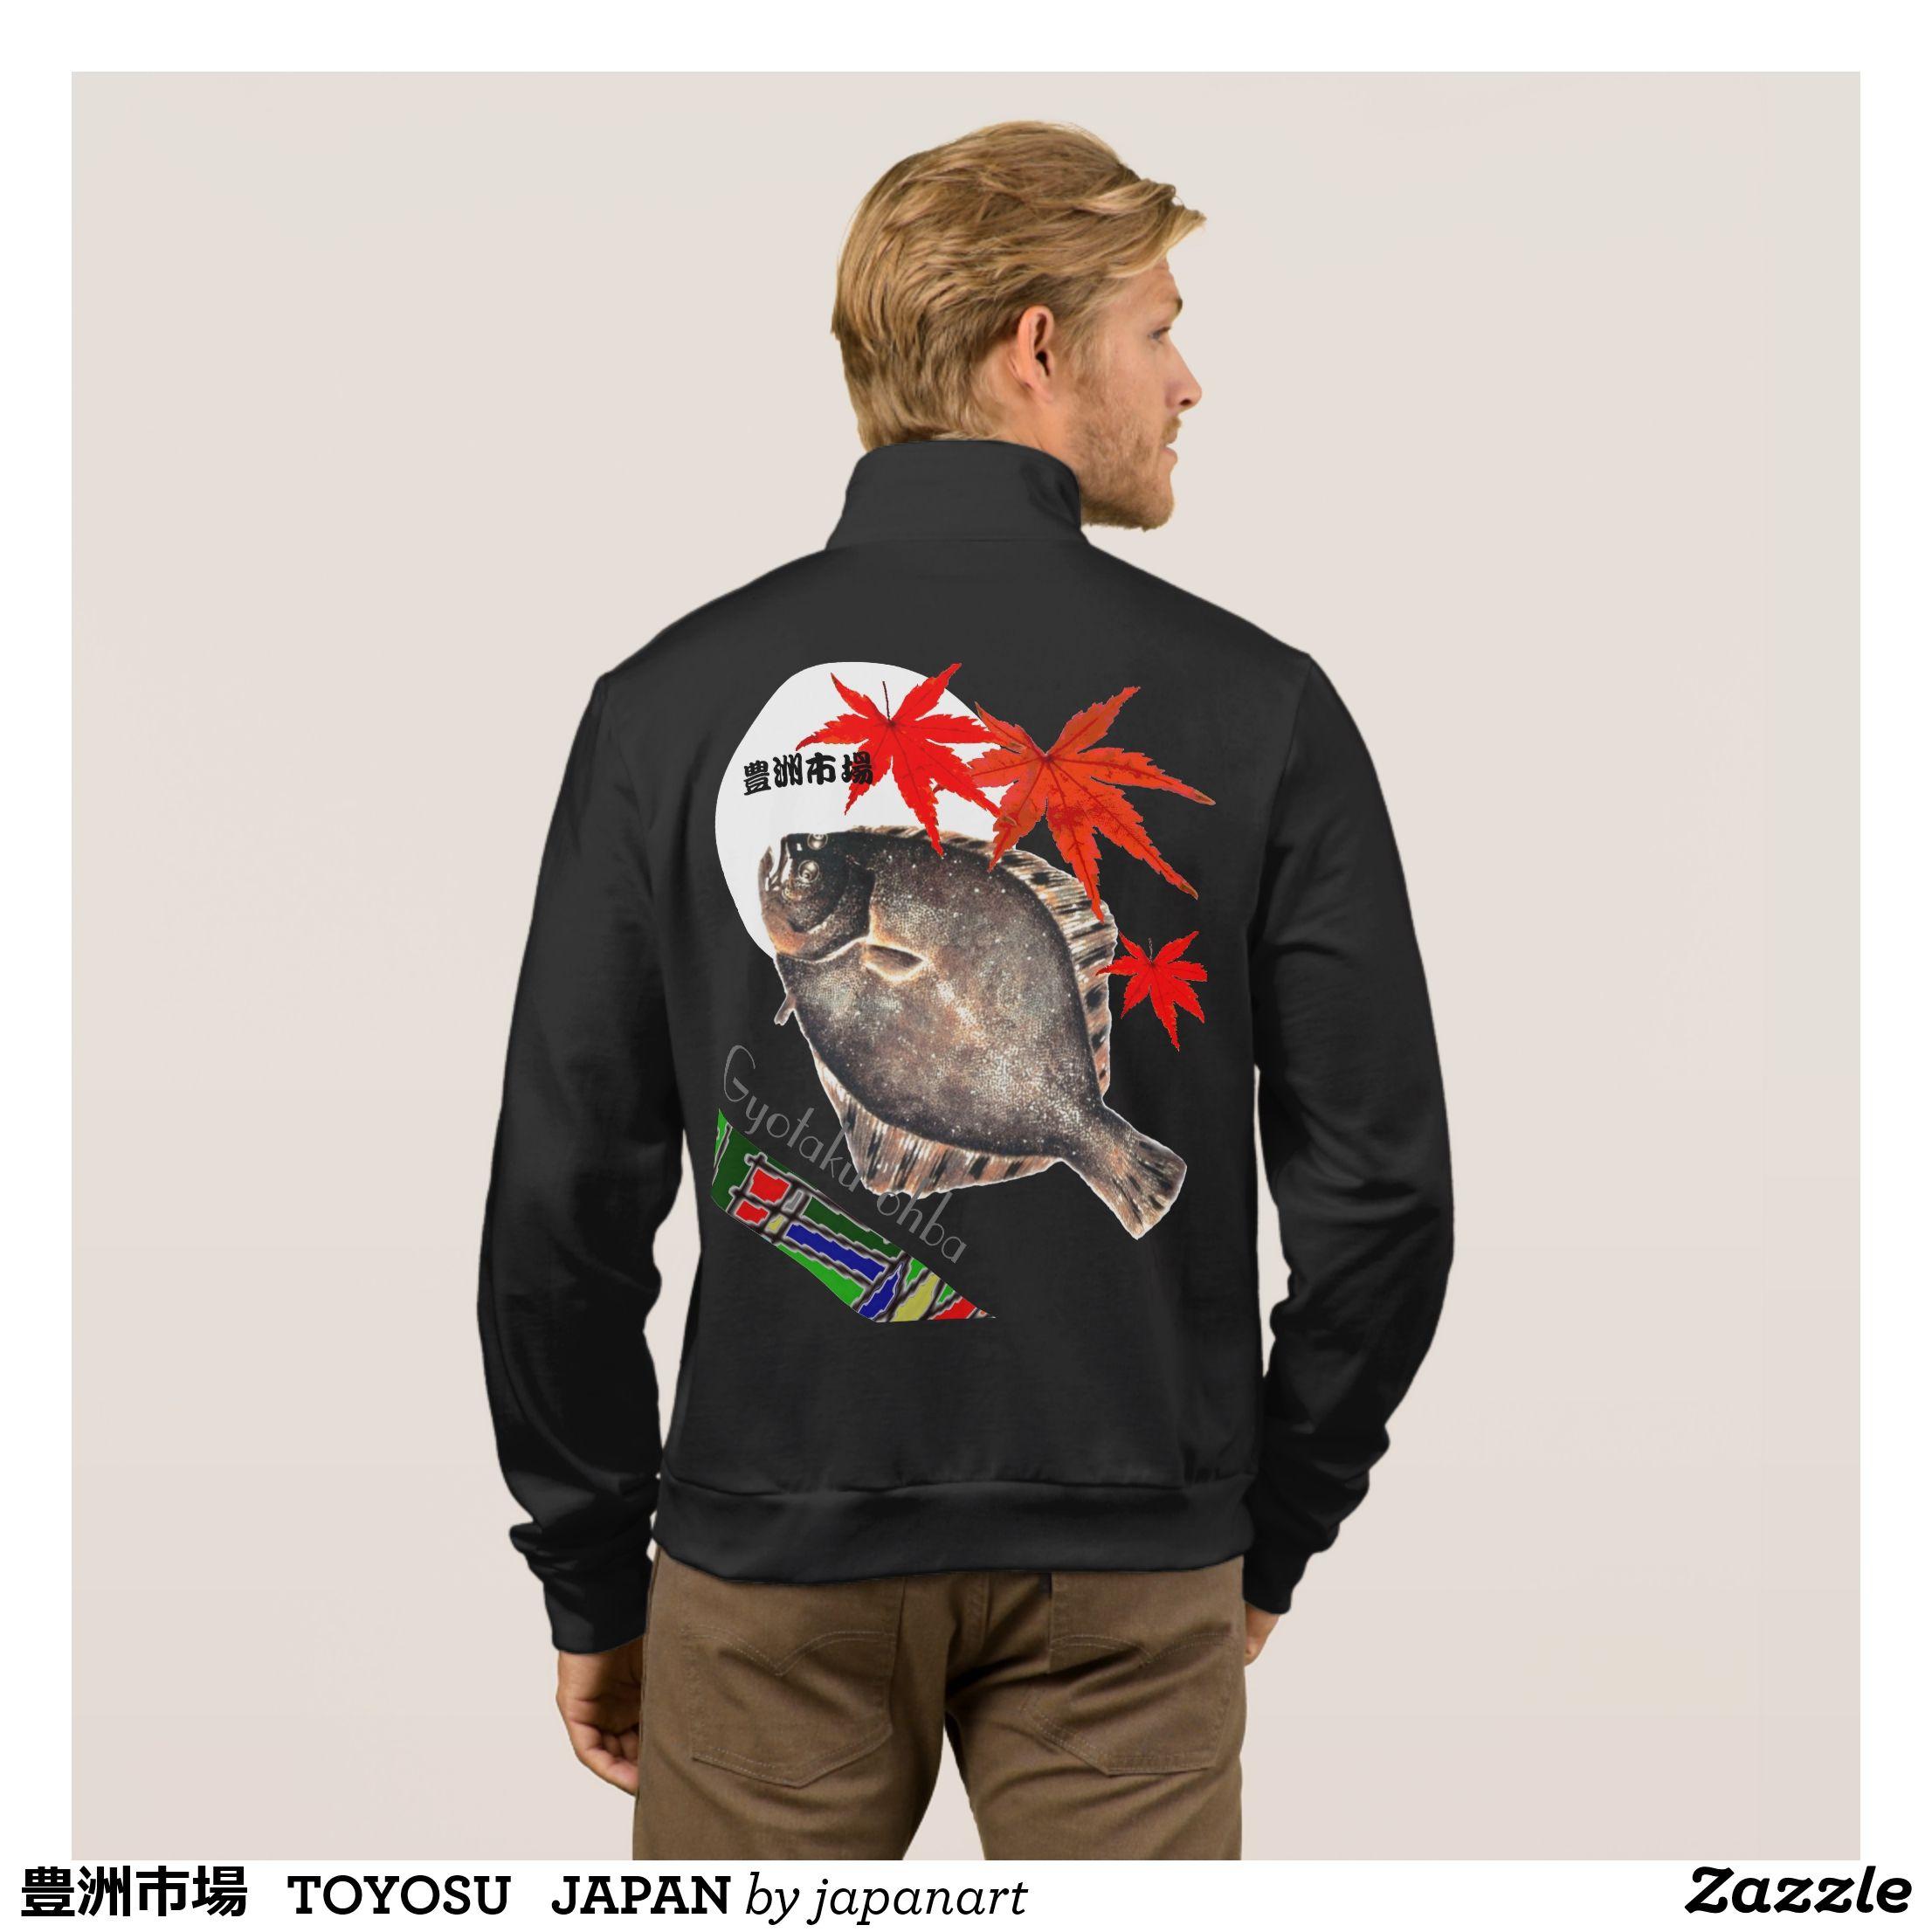 Yutaka State Market Toyosu Japan Jacket In 2018 Mens Jackets Sunfish Tshirts Shirts And Custom Clothing Thick Breathable Sports Joggers By Talented Fashion Graphic Designers Jogger Mensfashion